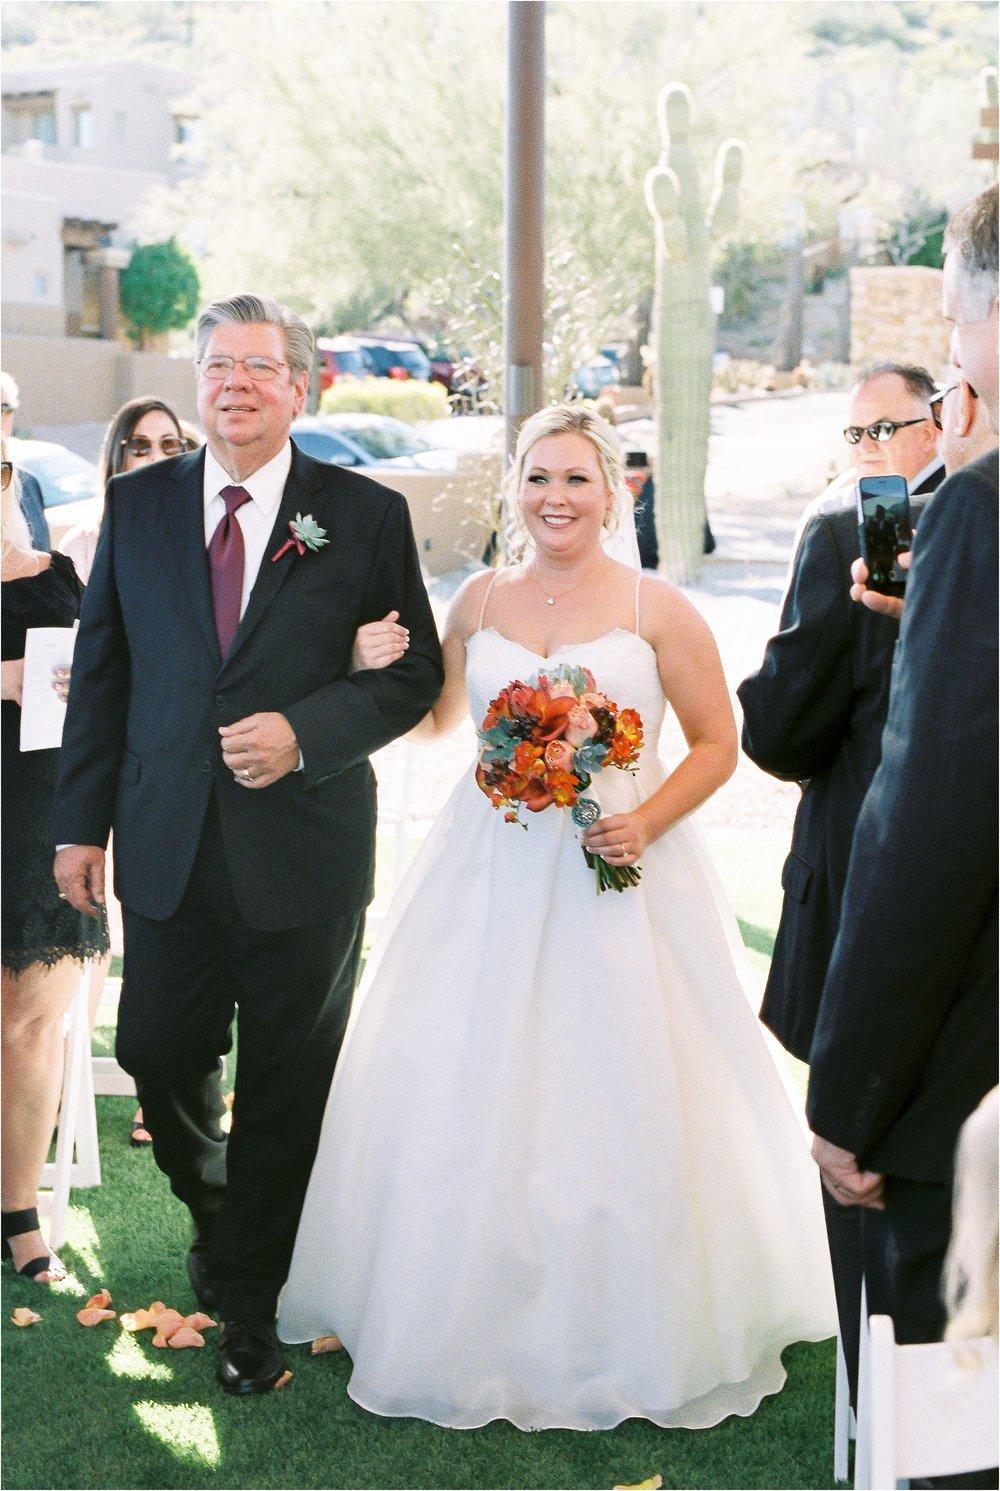 Sarah Jane Photography Film Hybrid Scottsdale Phoenix Arizona Destination Wedding Photographer Scott and Rachel_0022.jpg